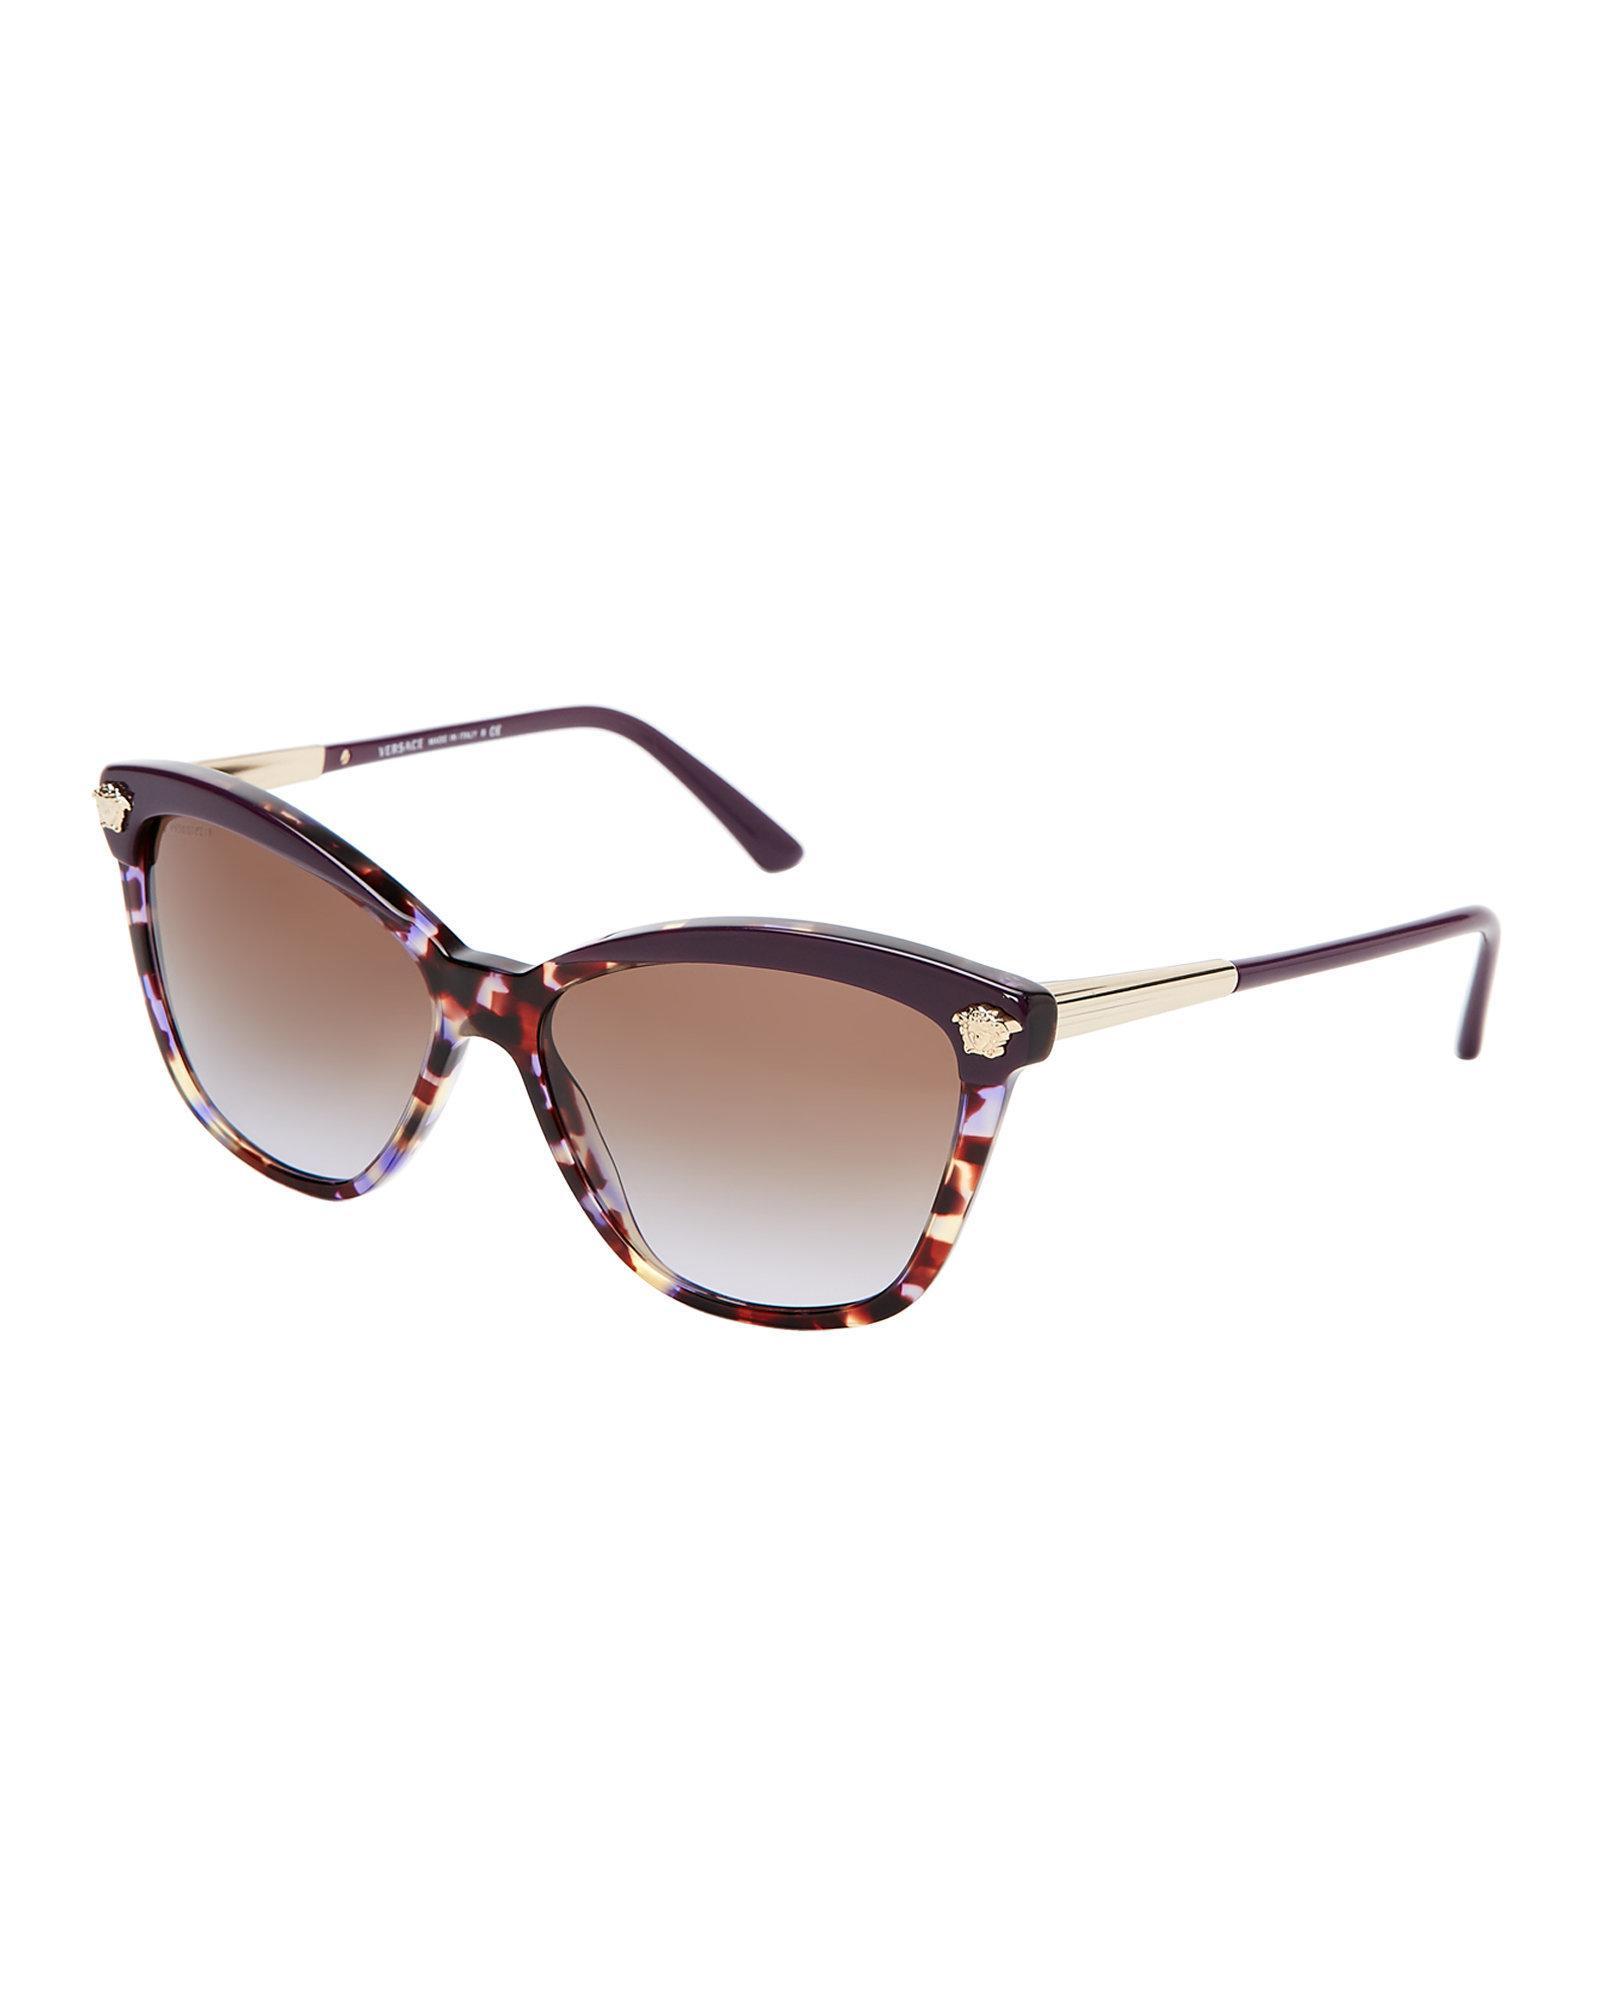 925e8fb3c6f5 Lyst - Versace Ve4313 Tortoiseshell-look Cat Eye Sunglasses in Brown